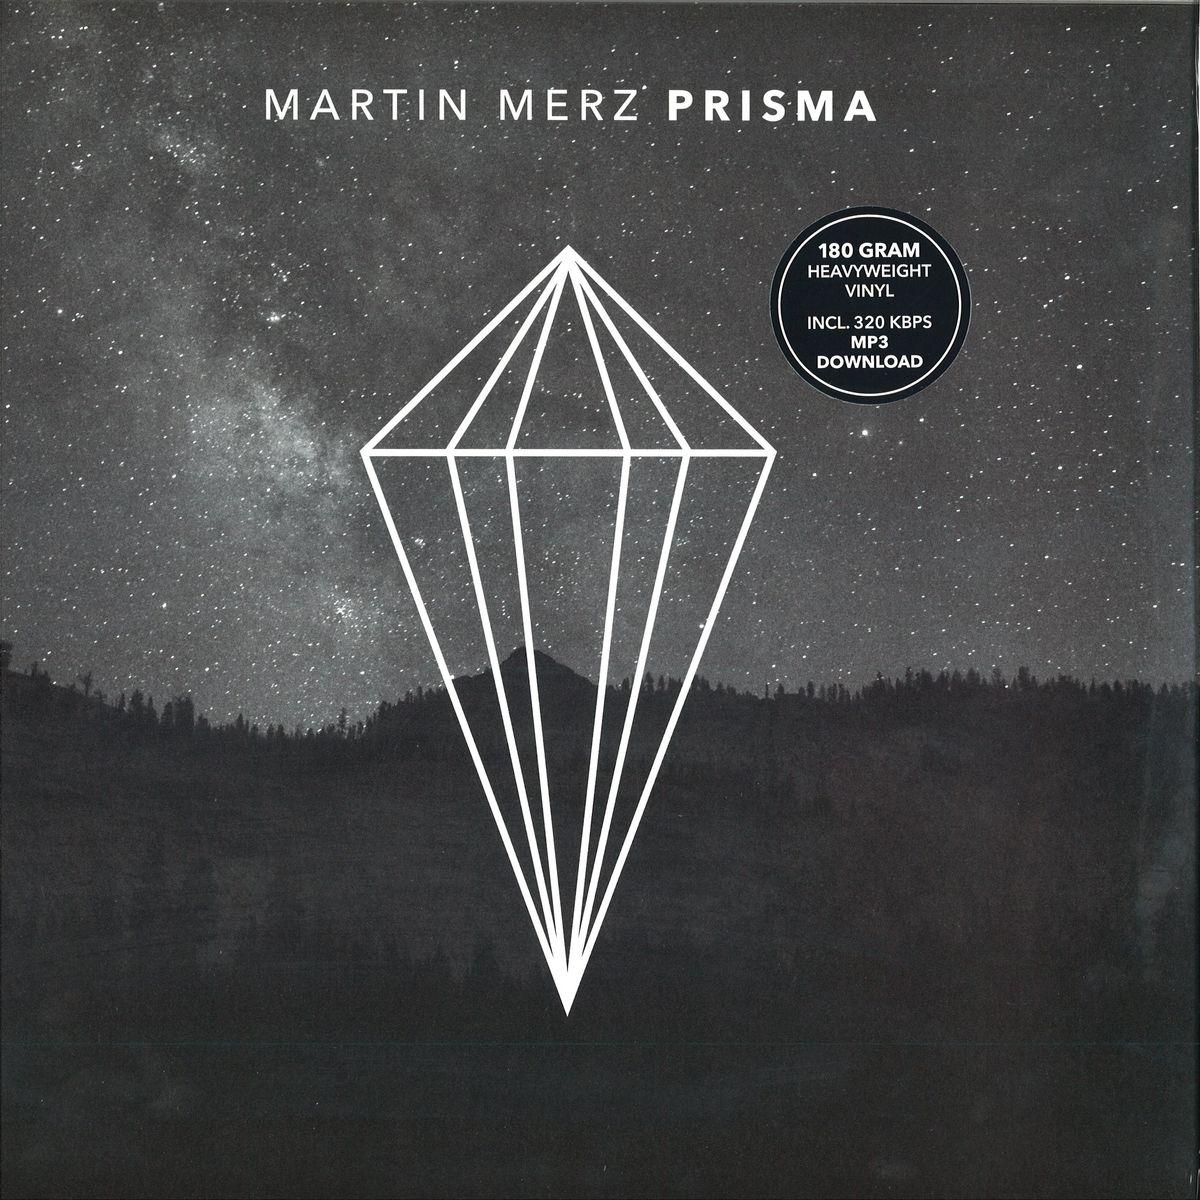 Martin Merz Prisma Vordergrundmusik Vgm008 Vinyl